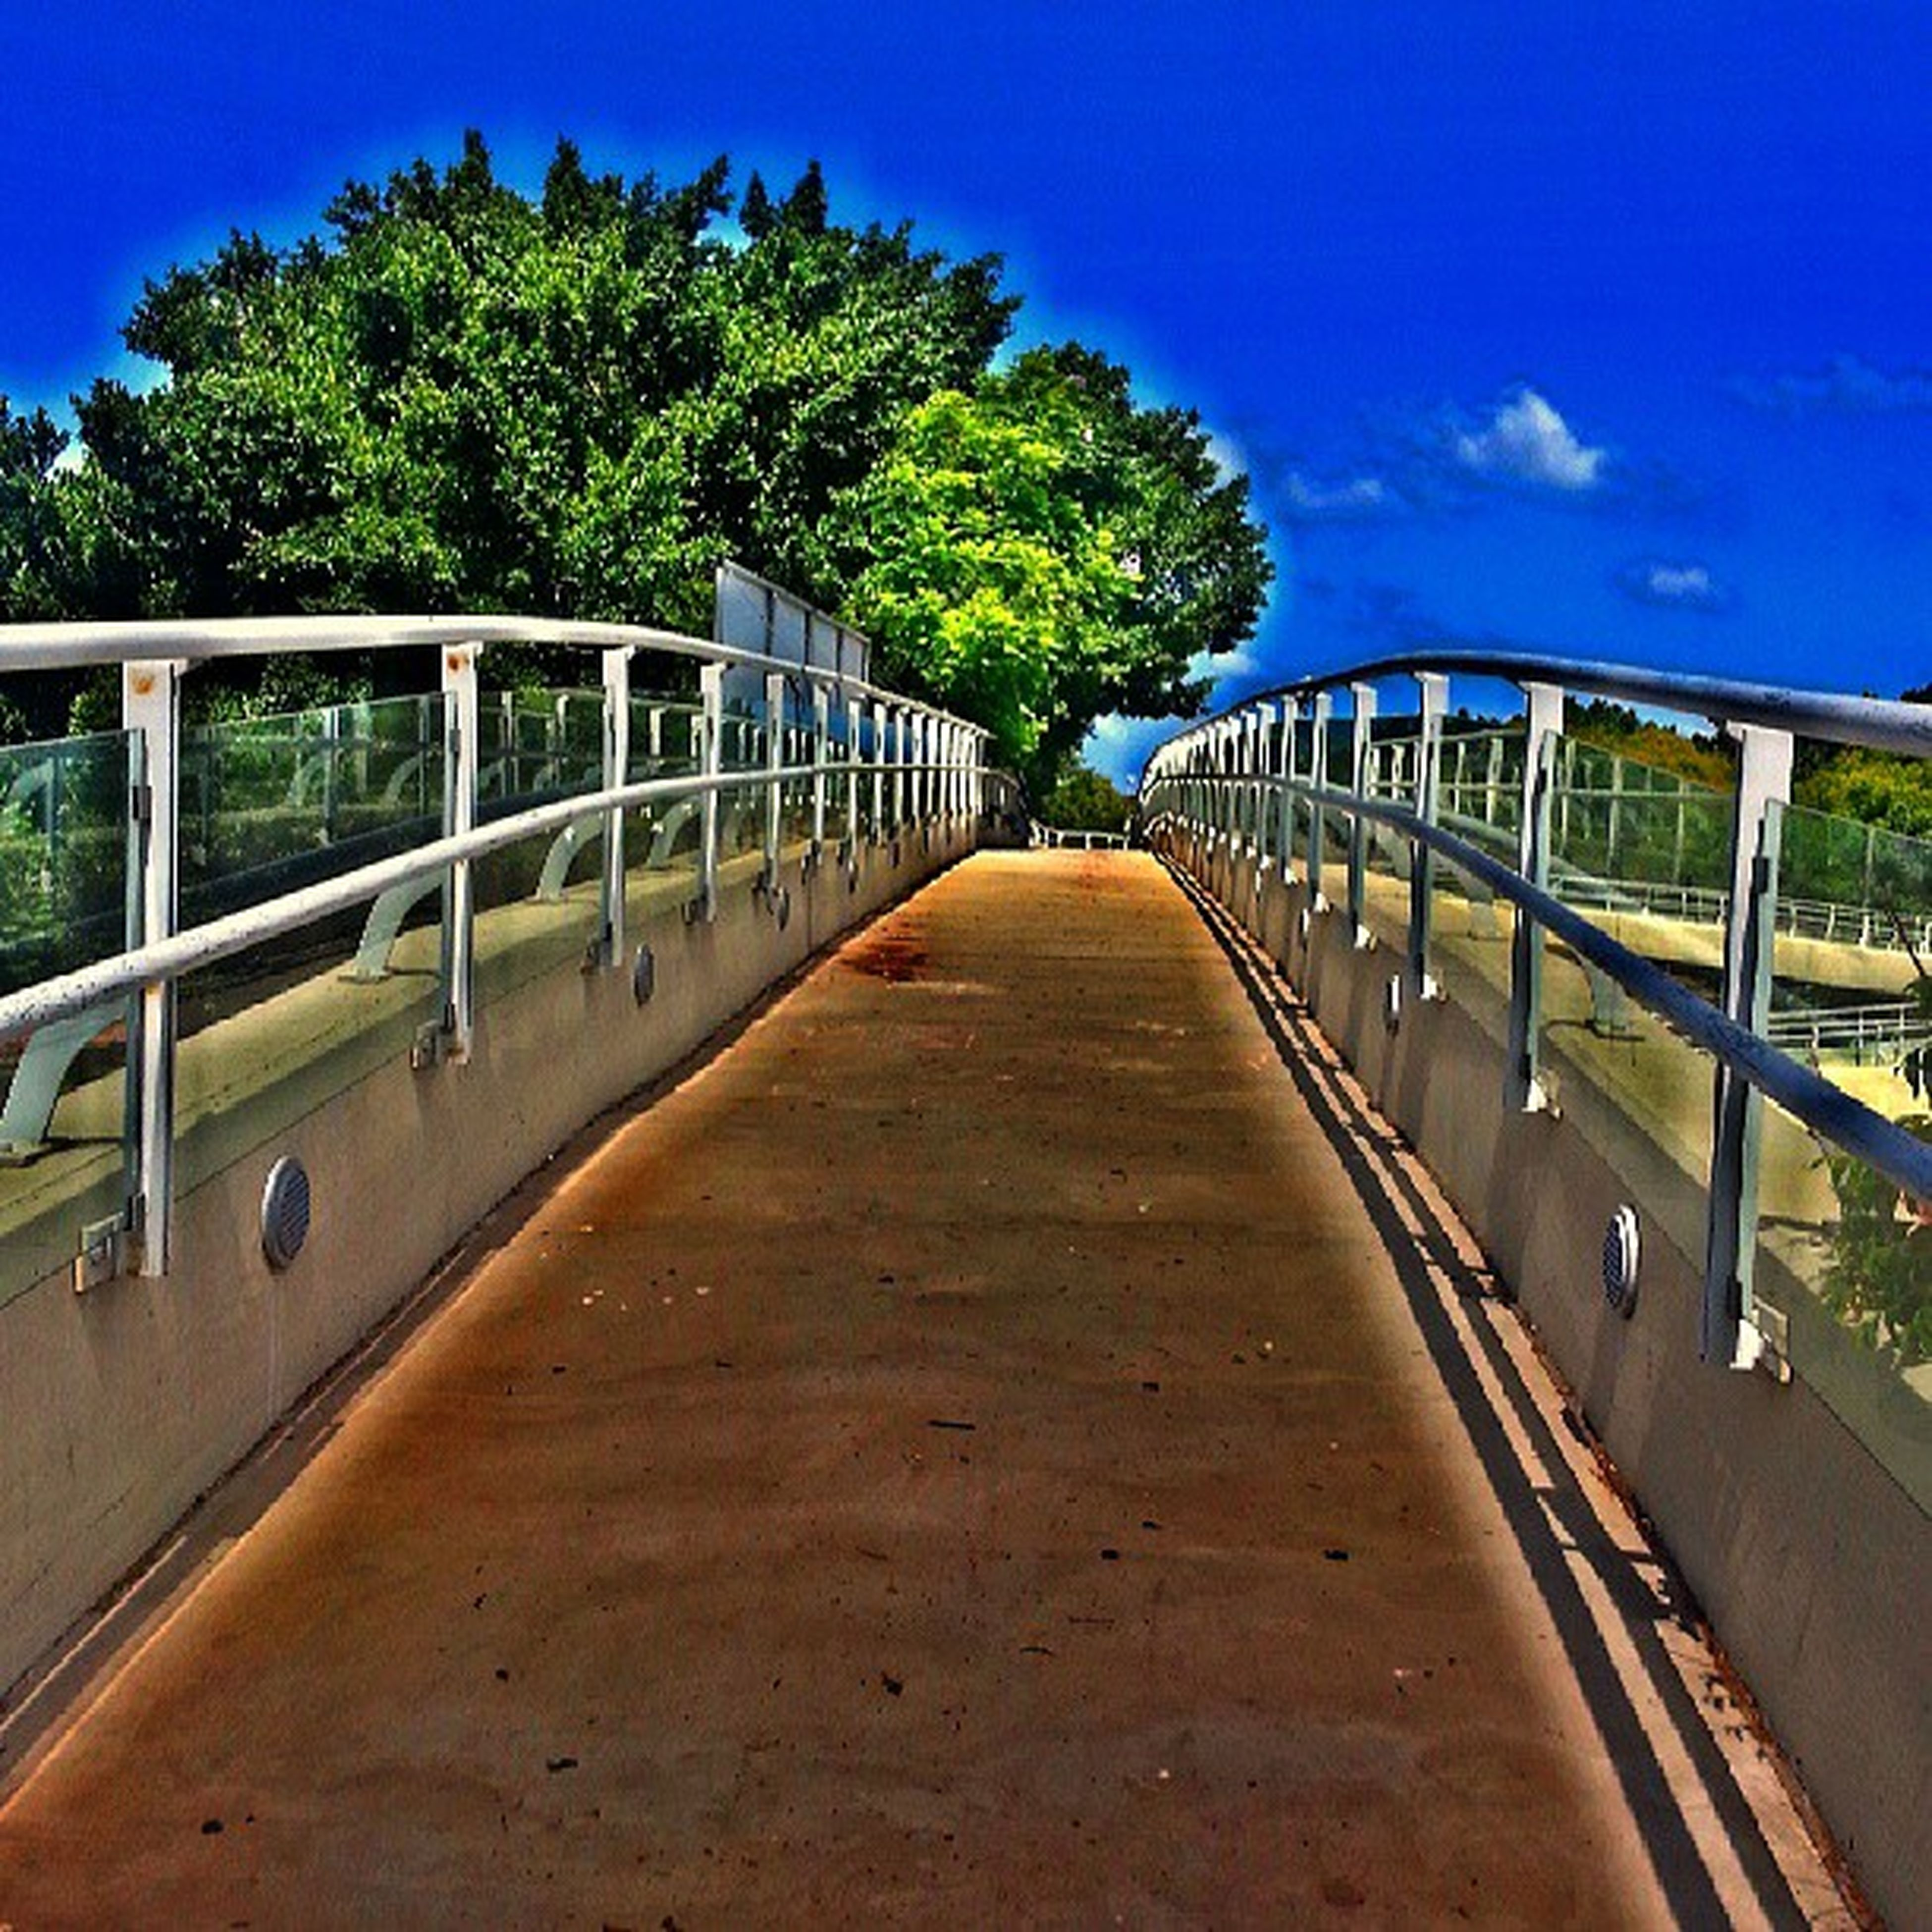 the way forward, tree, diminishing perspective, railing, vanishing point, connection, long, sky, blue, transportation, built structure, bridge - man made structure, tranquility, footbridge, shadow, road, tranquil scene, walkway, empty, nature